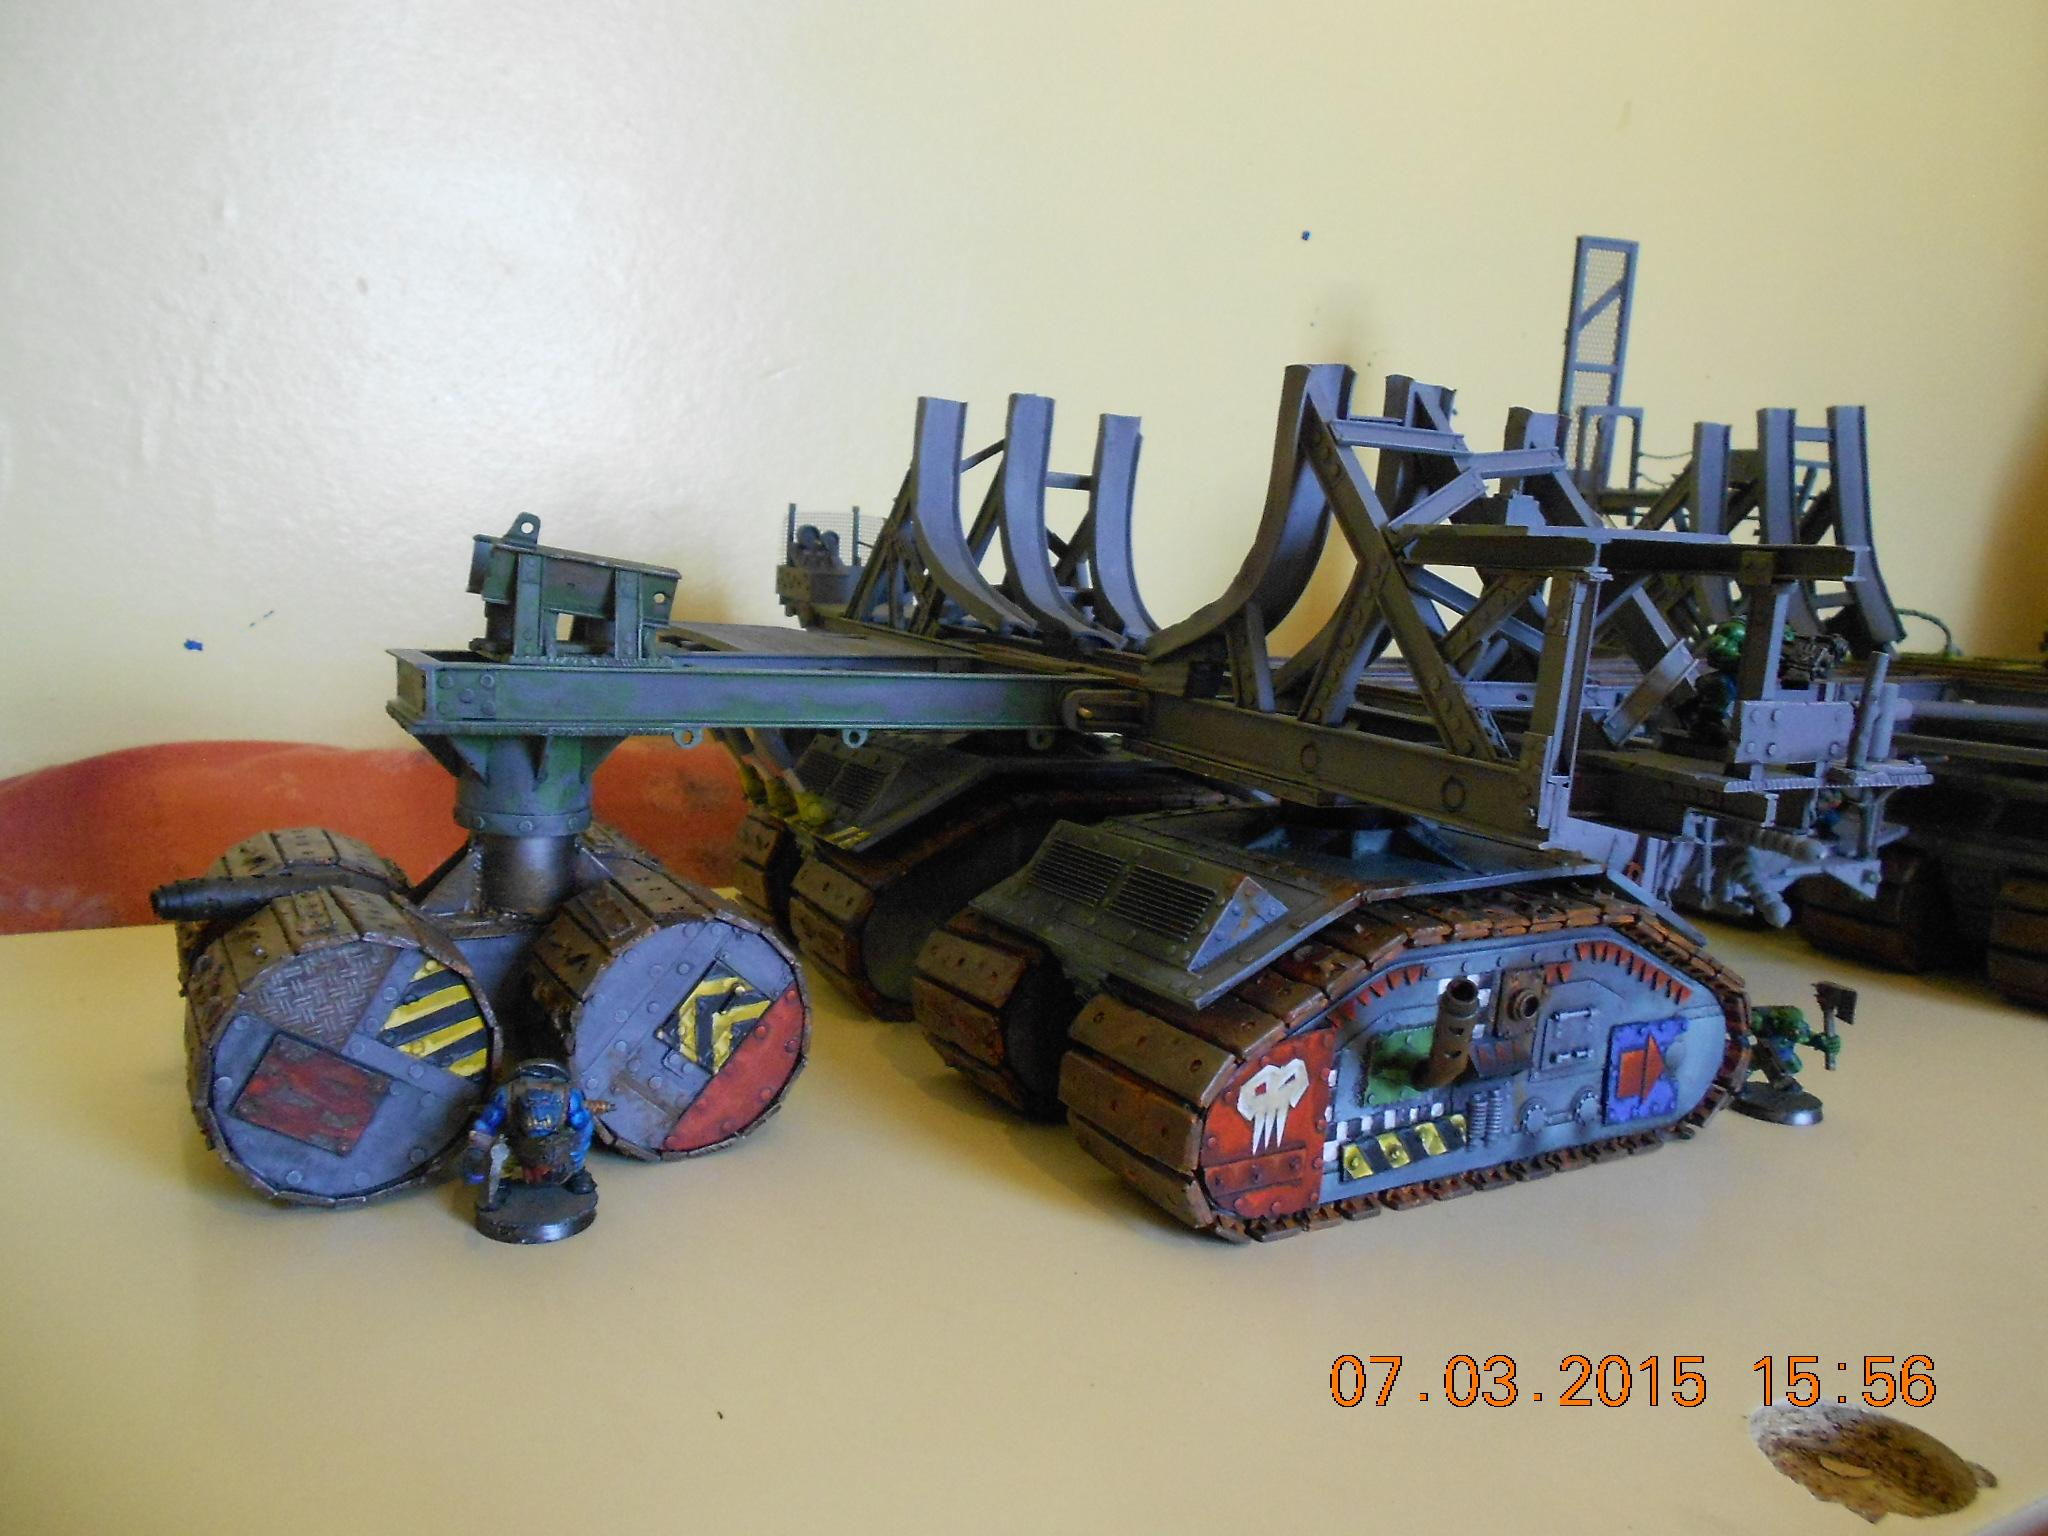 Cradle, Death Roller, Dreadnought, Track Unit, Warship